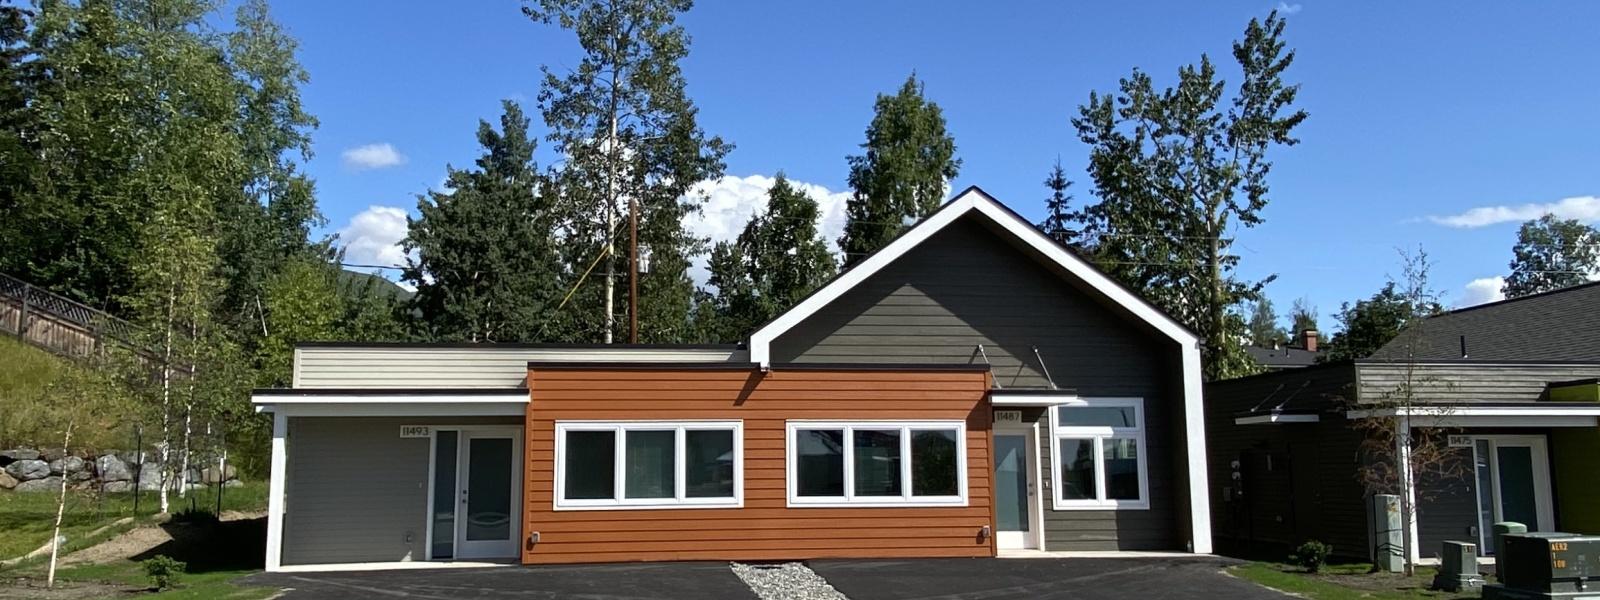 Exterior Family Duplexes